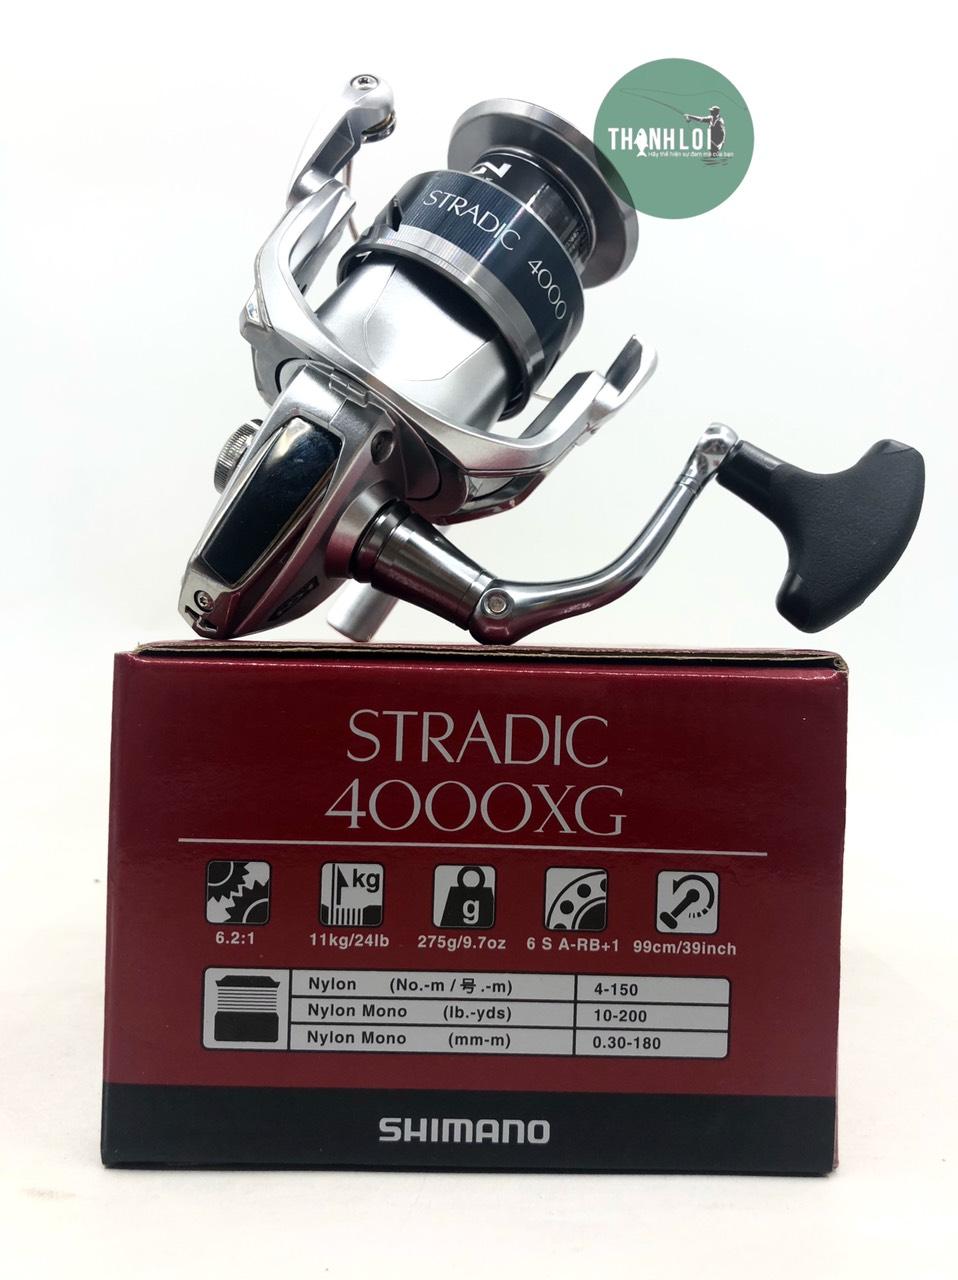 MÁY SHIMANP STRADIC XG